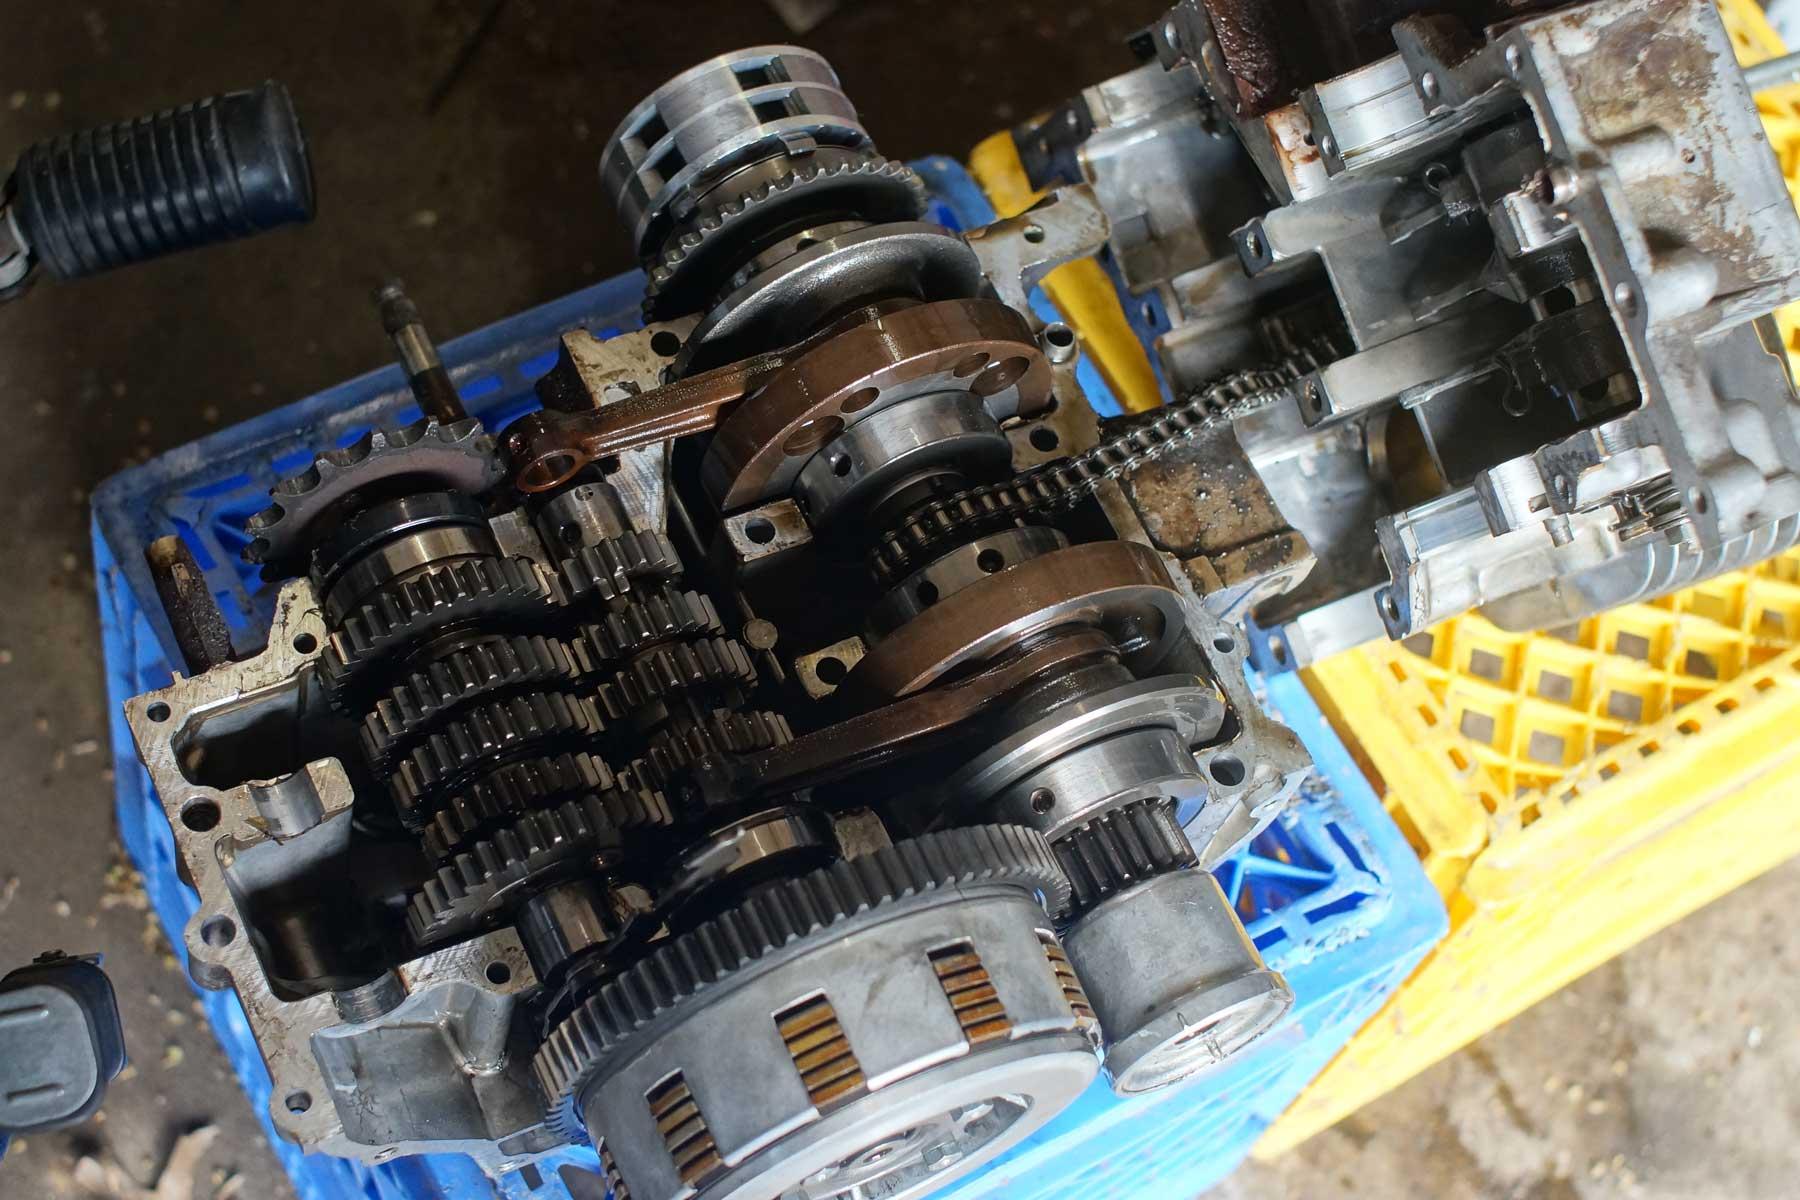 hight resolution of cb200 wiring diagram wiring diagram1974 honda cb200 cl200 engine rebuild tutorial dan nix mix honda cb200